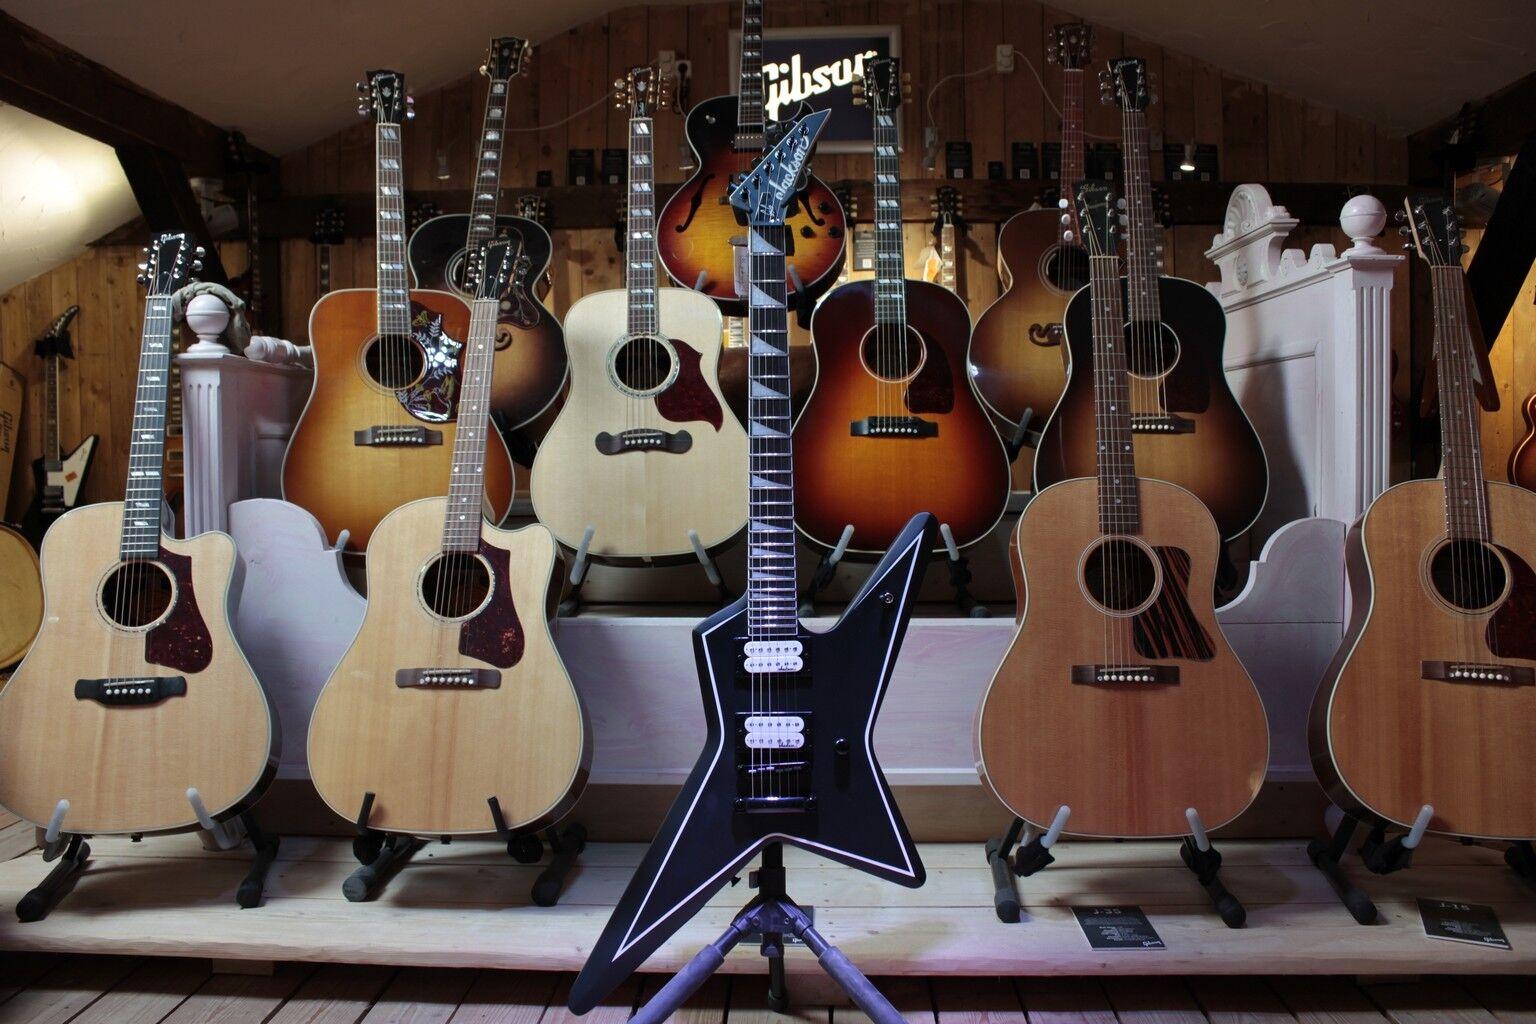 Jackson js32 Gus G Star en satén negro-e-guitarra  B-Ware, B-Ware, B-Ware, ópticos deficiencias  cedaa7